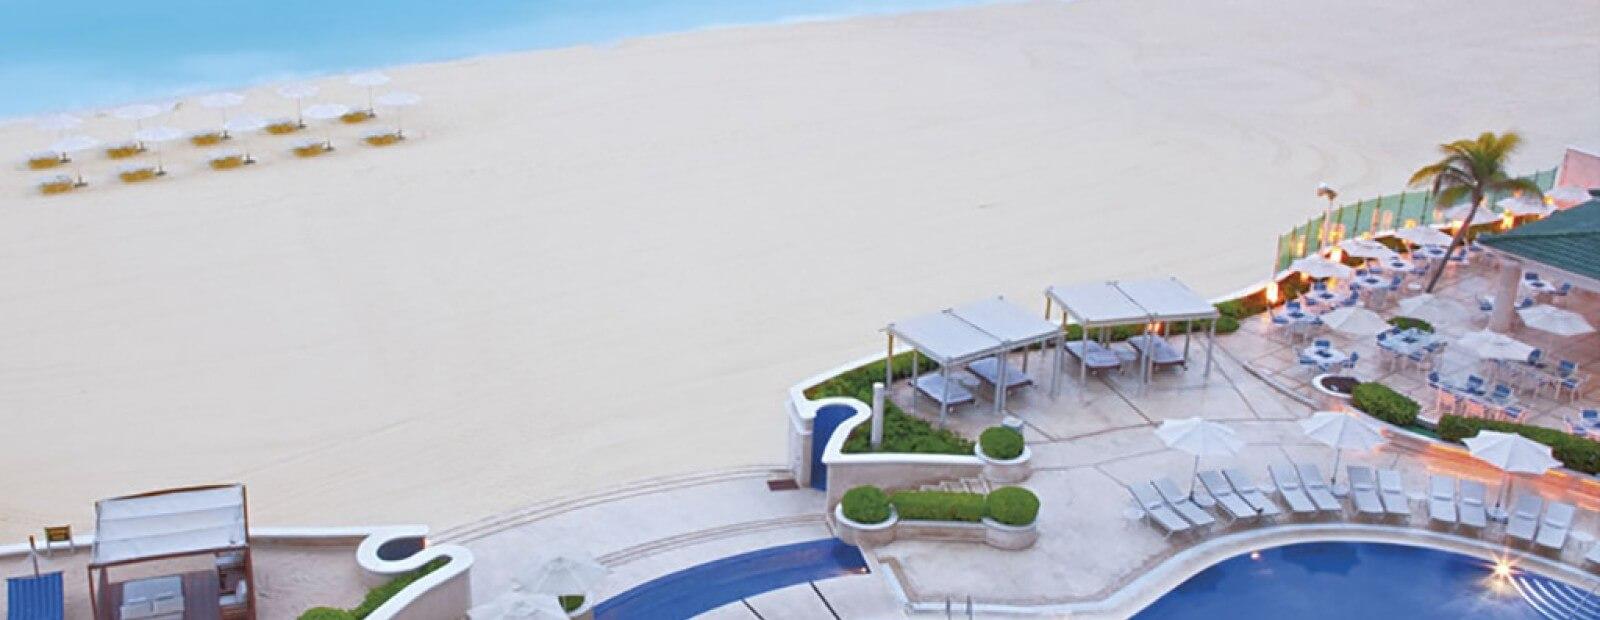 Vacation Deals Cancun